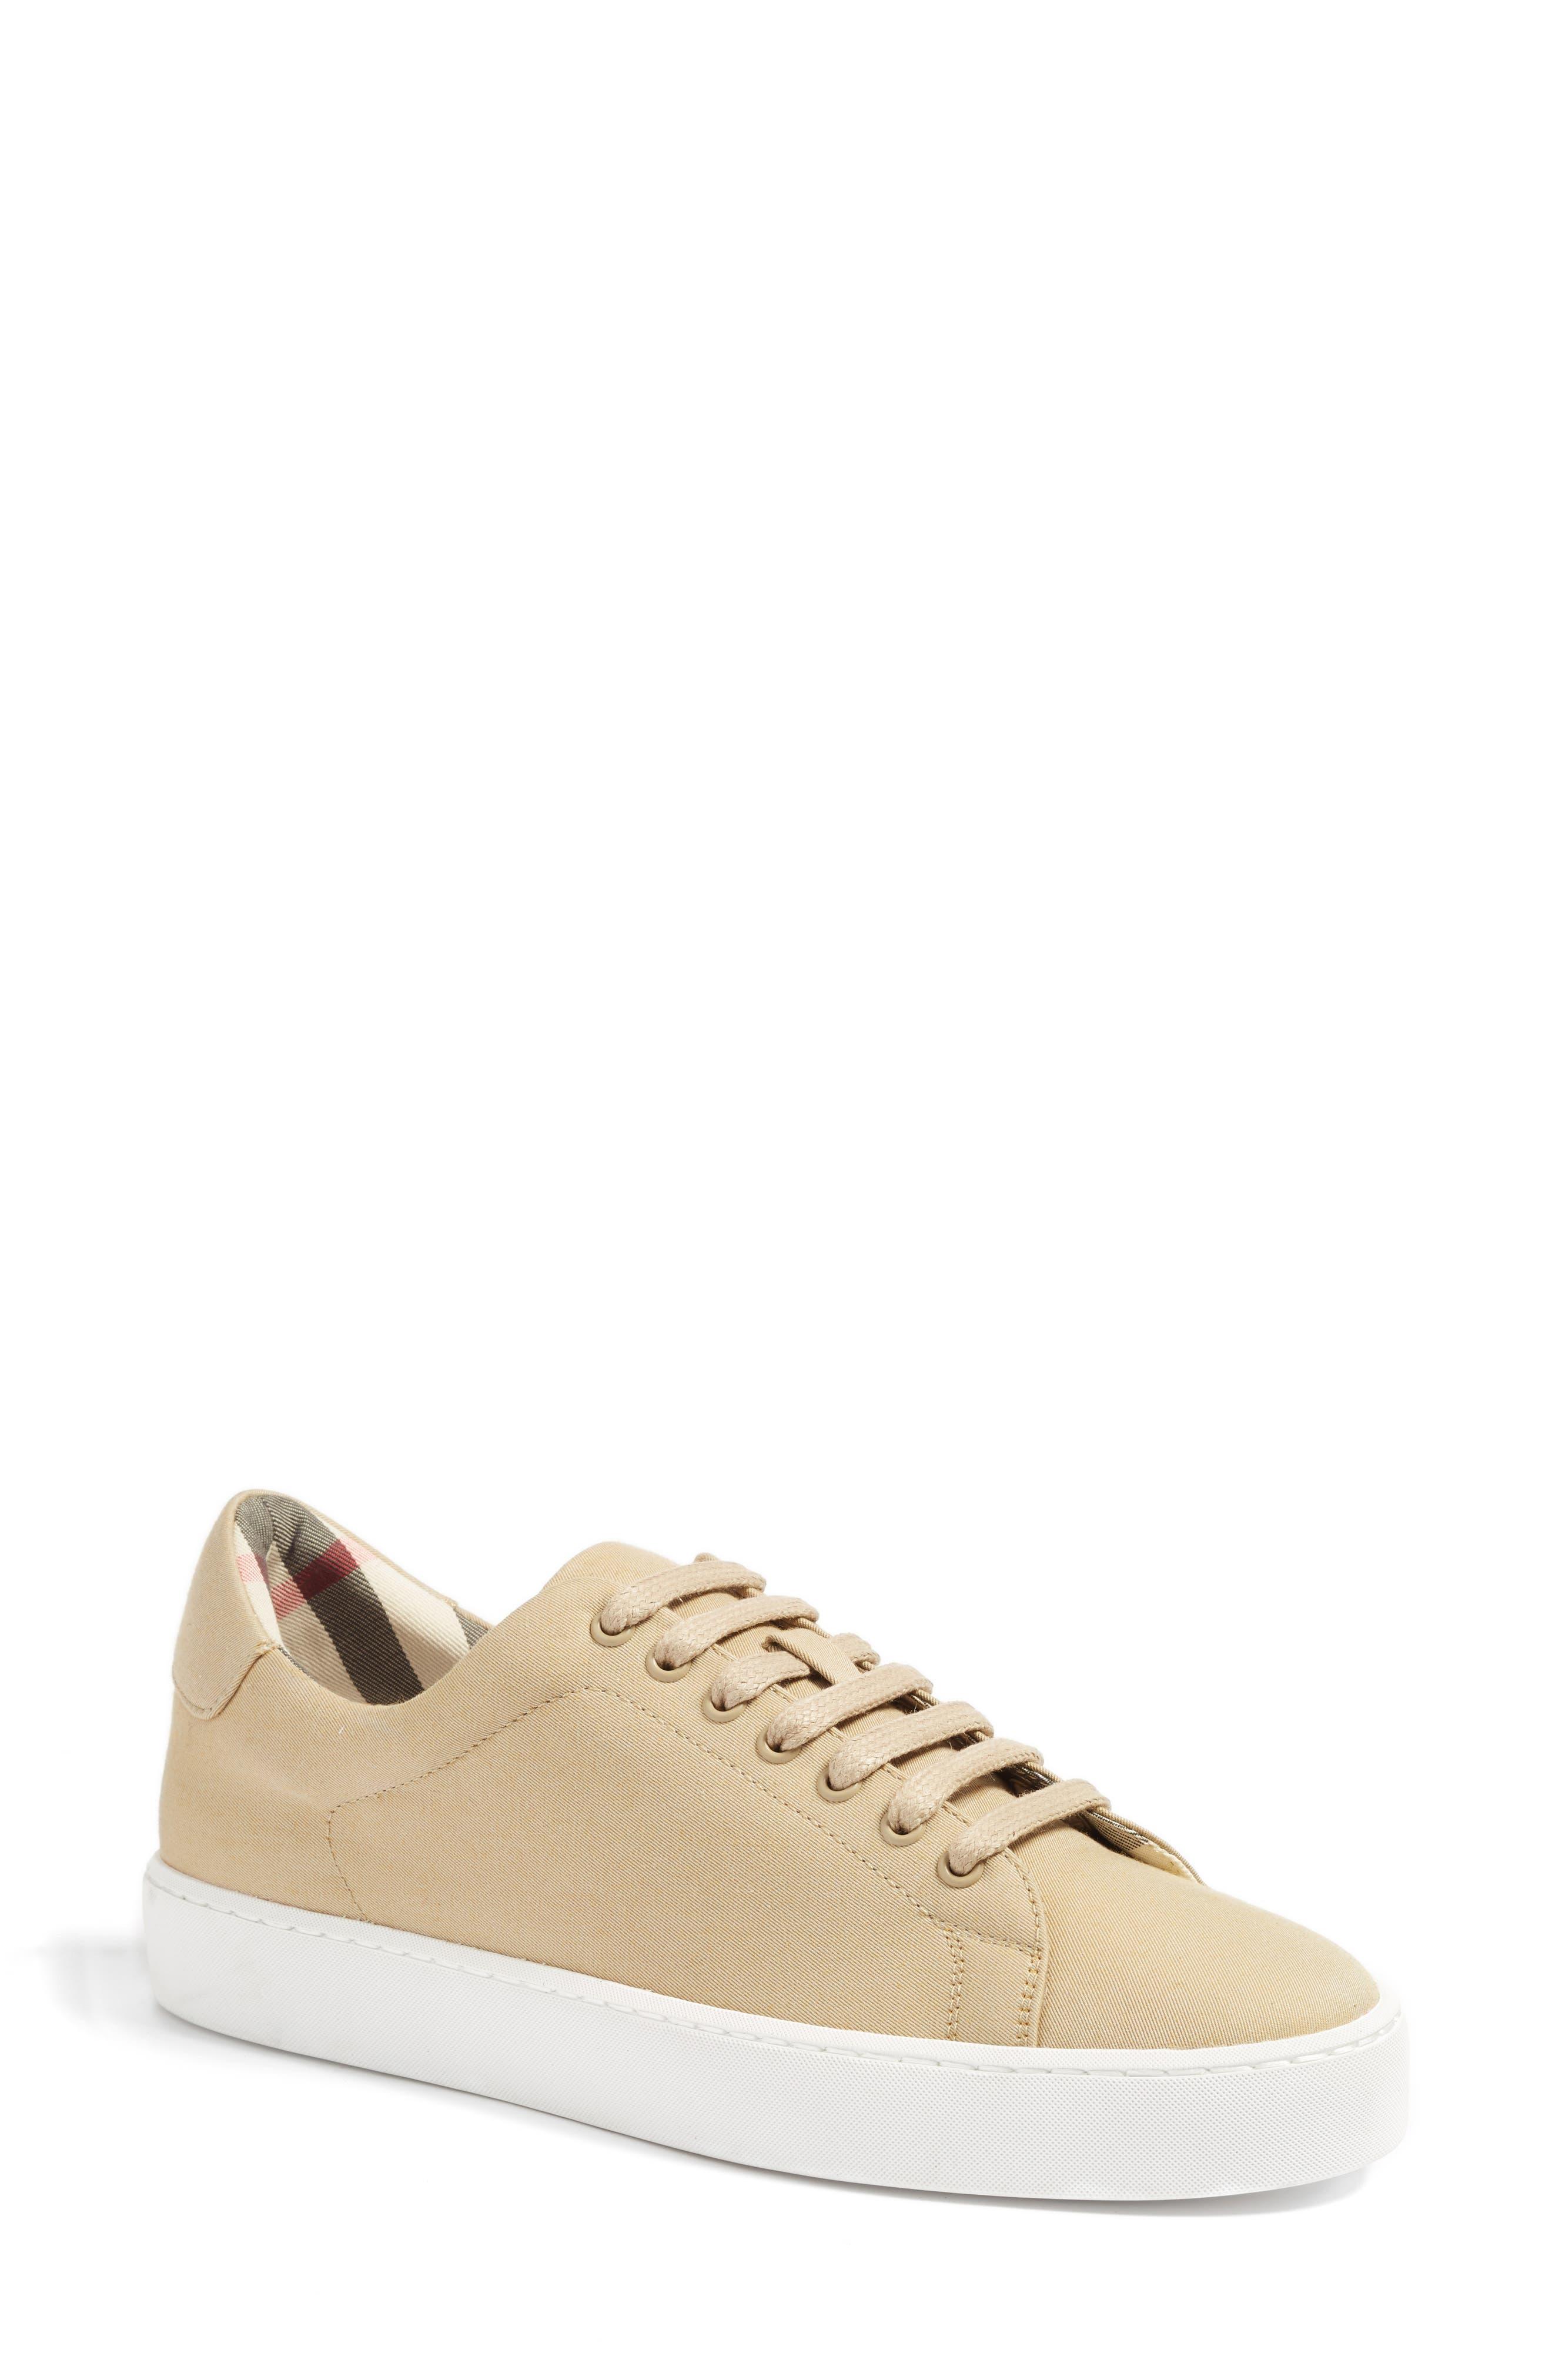 Main Image - Burberry Westford Sneaker (Women)